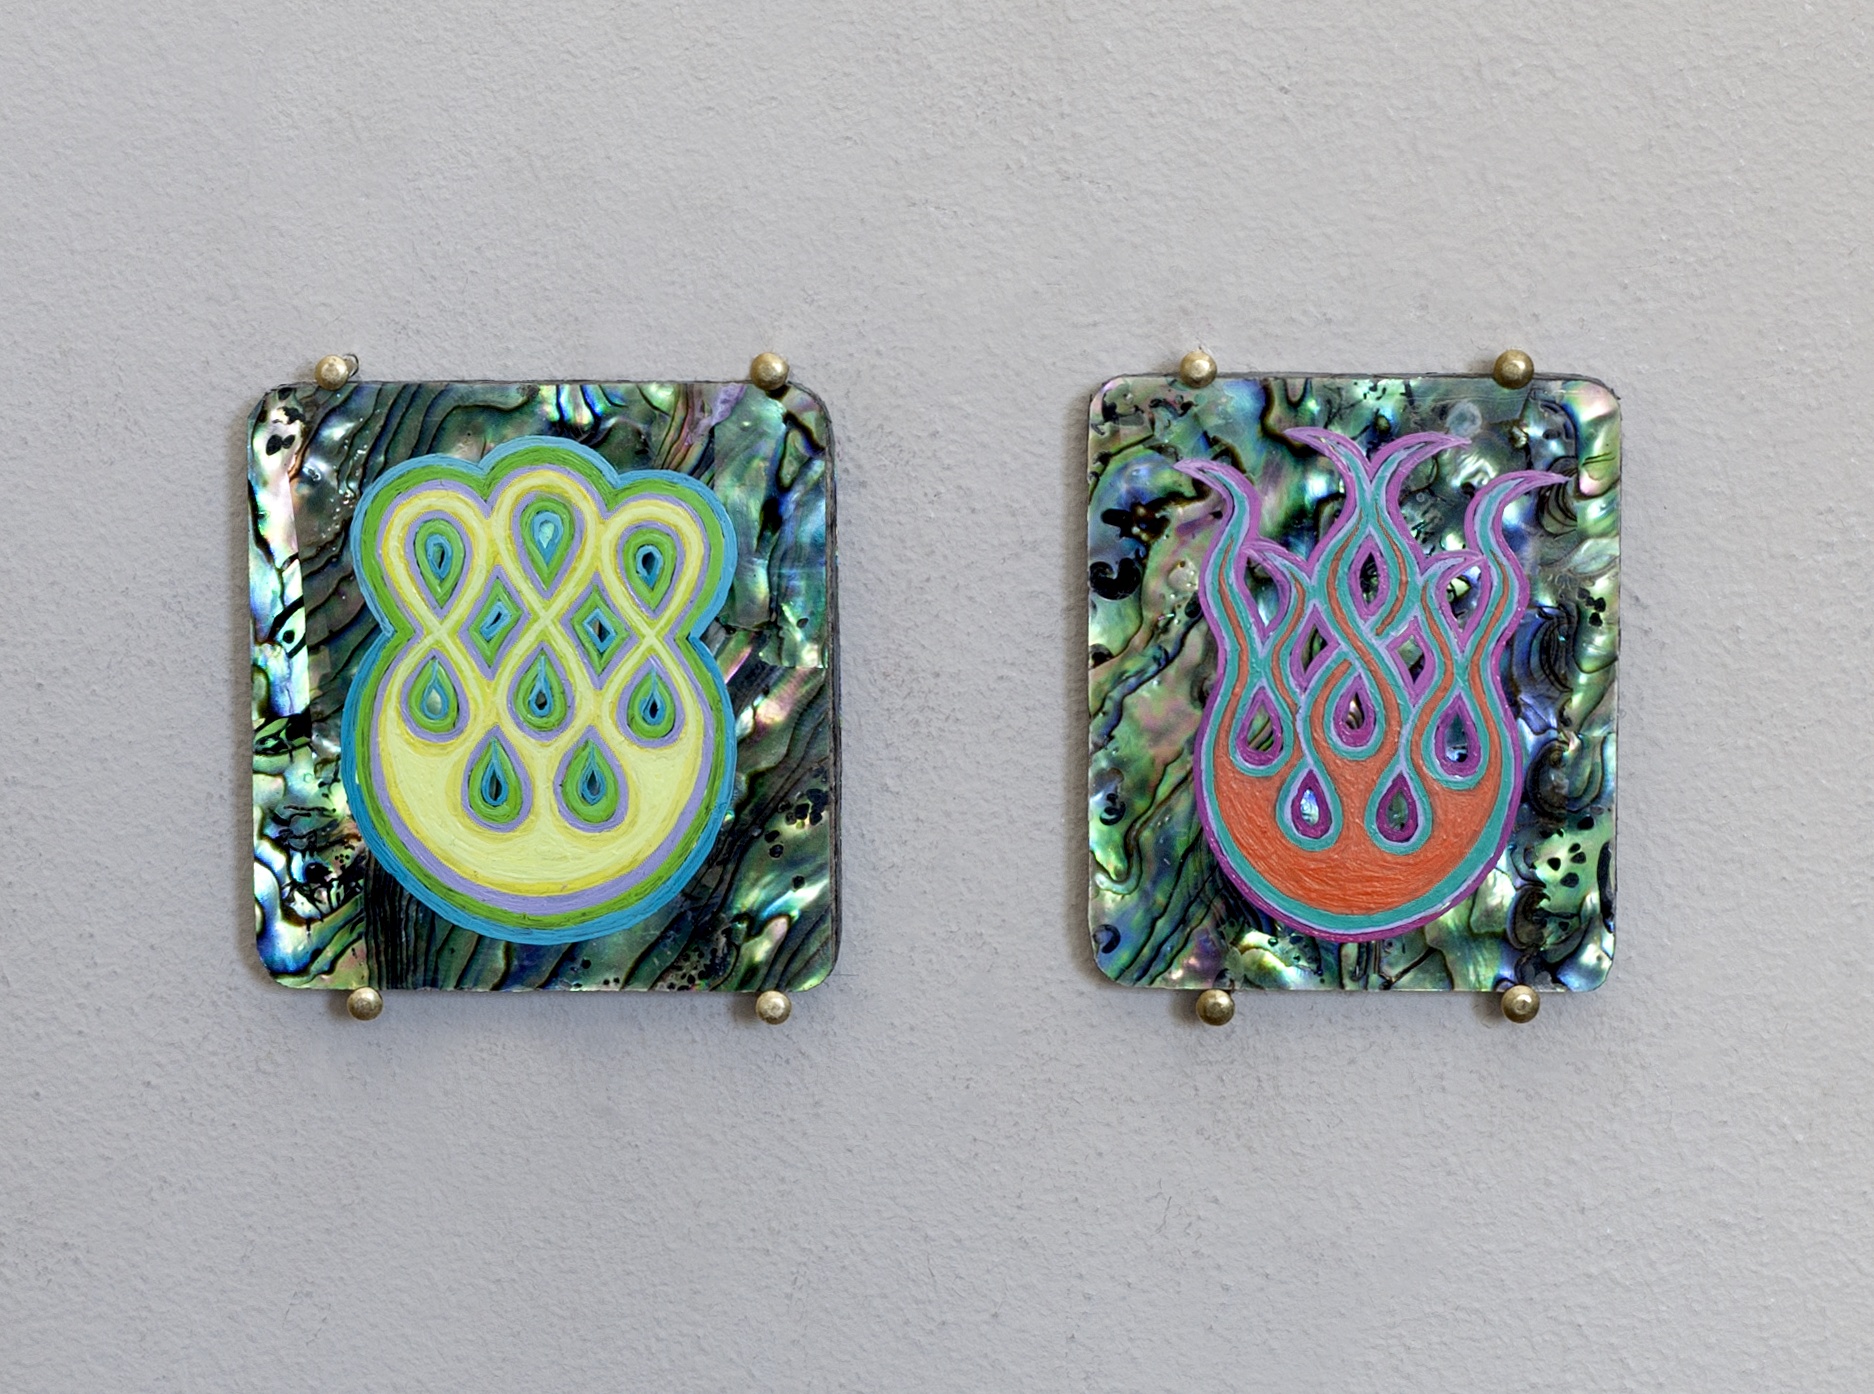 Eight small Stigmata & Seaweed motif